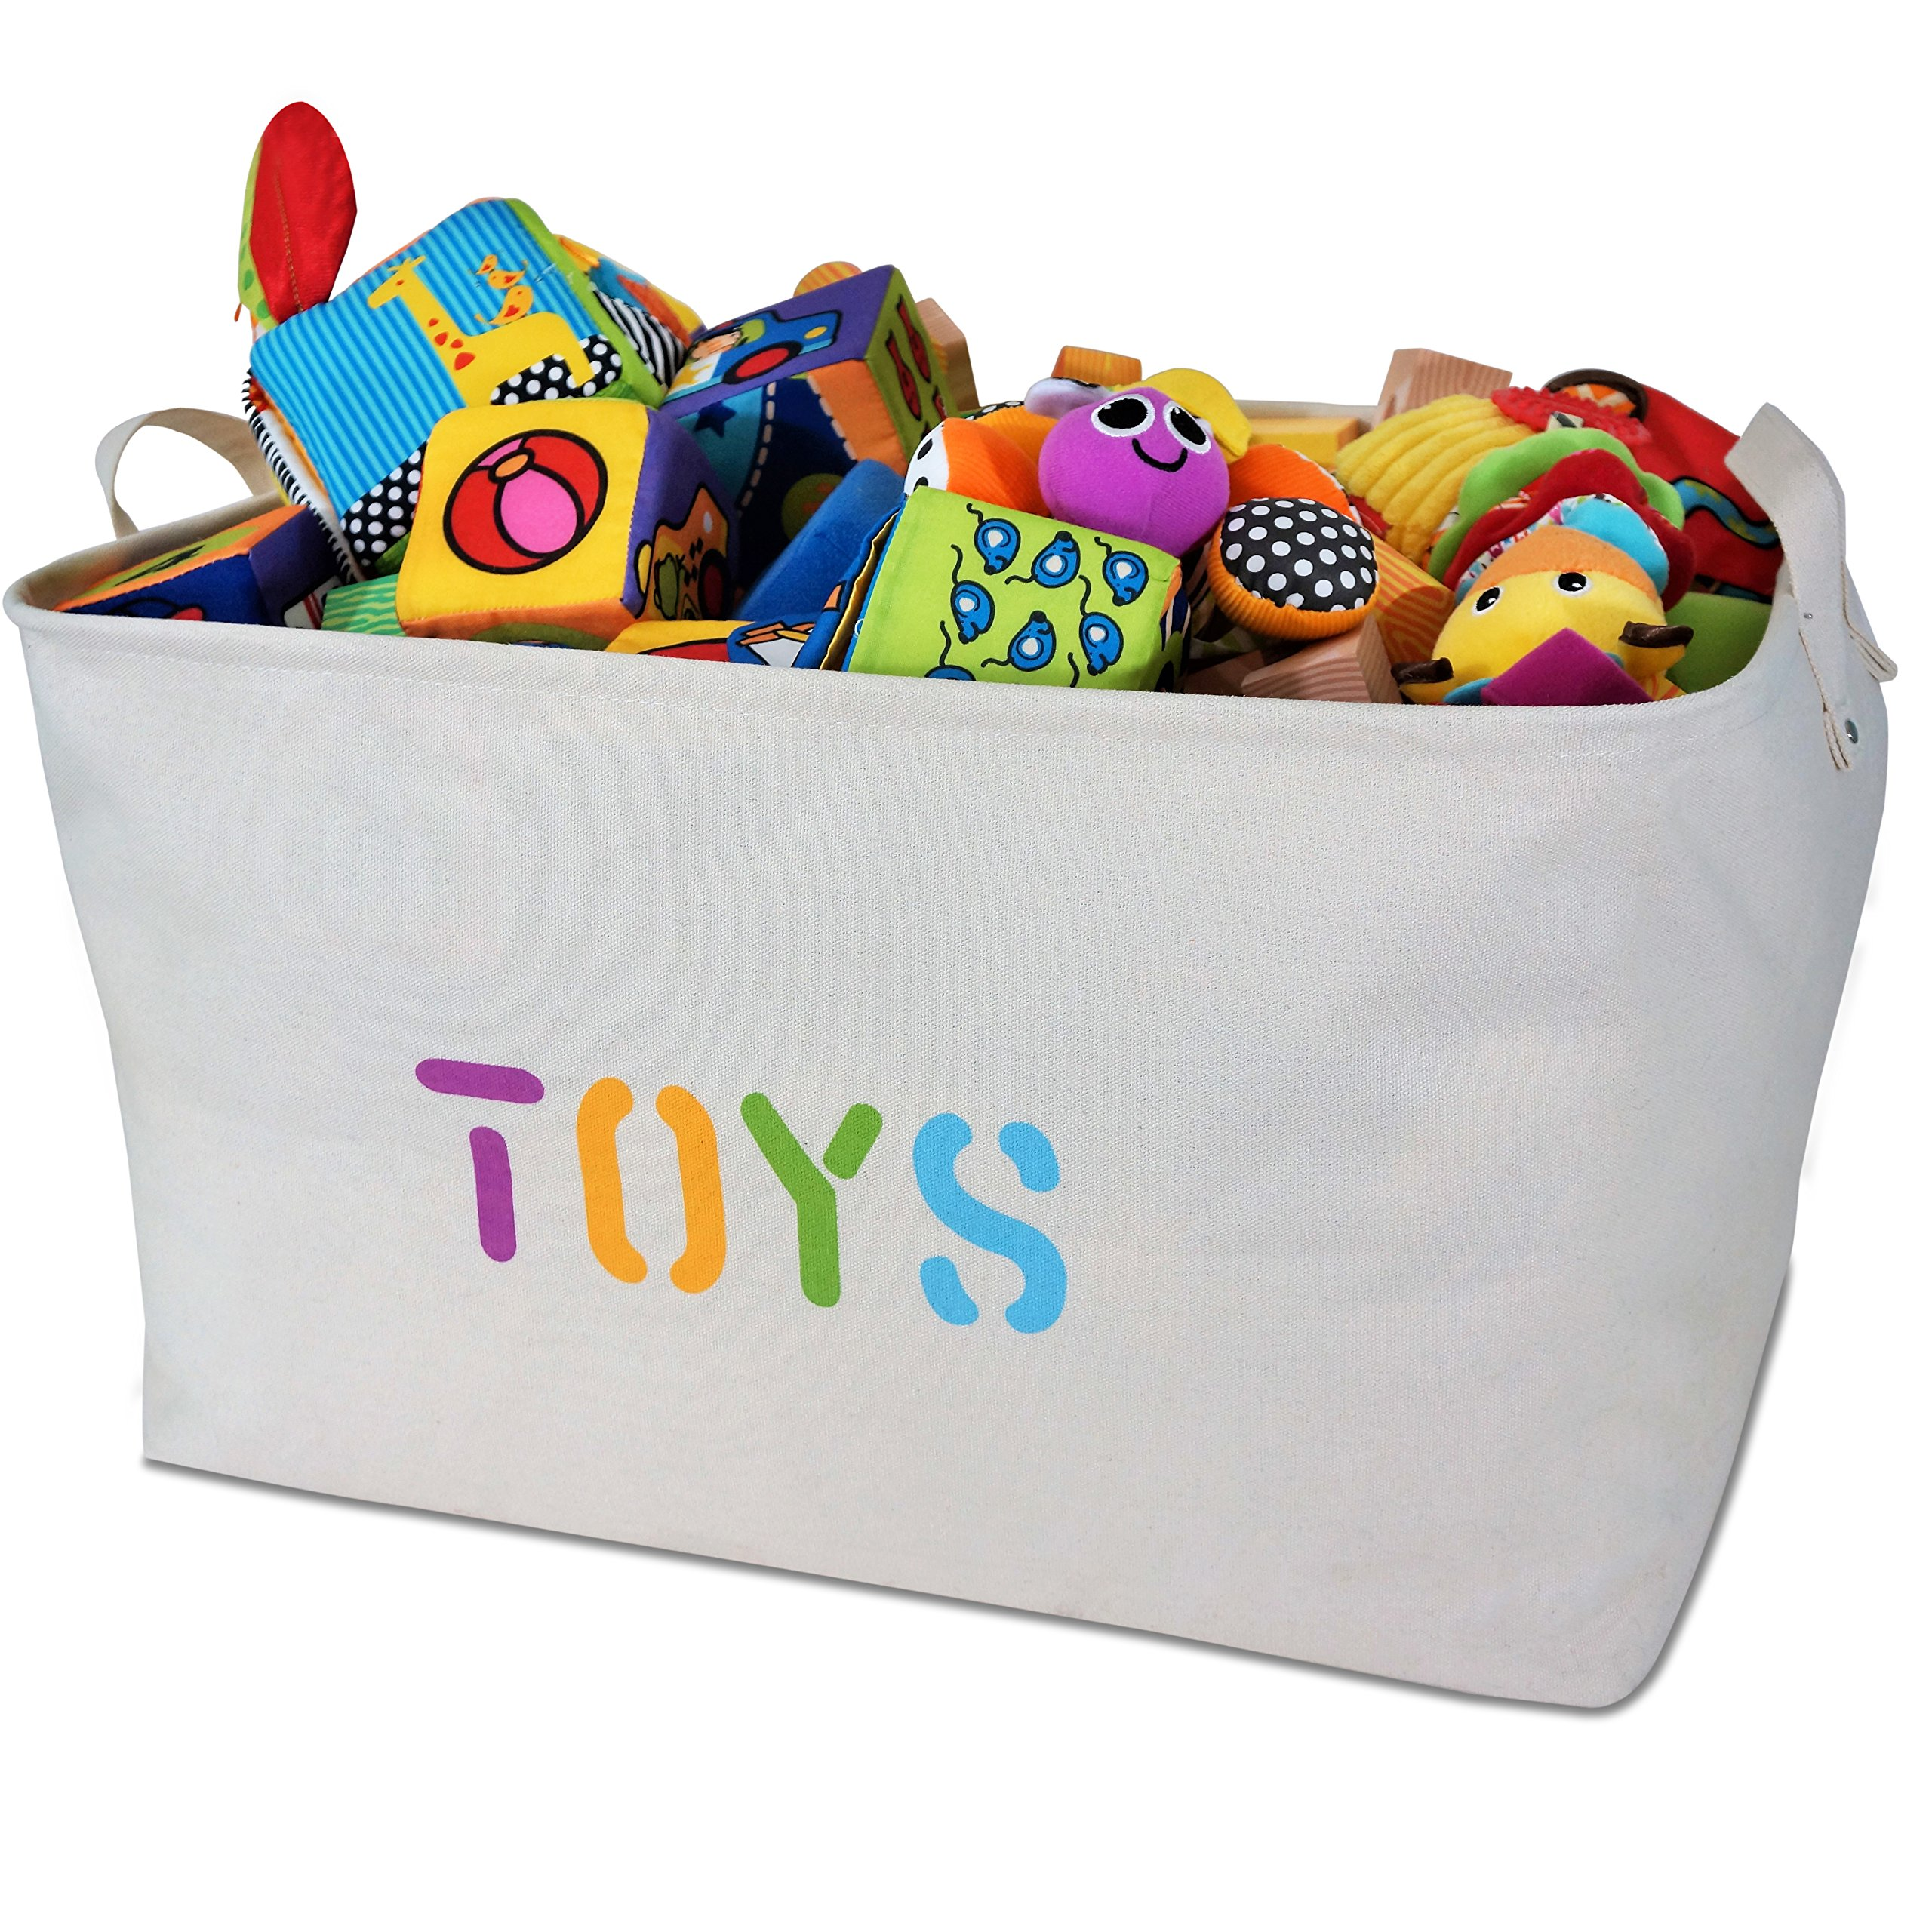 "OrganizerLogic Toy Storage Bins - 22"" x 15"" x 13"" Canvas Extra Extra Large Basket for Organizing Your Toys, Kids, Pets, Laundry - Cute Baskets (XXL)"